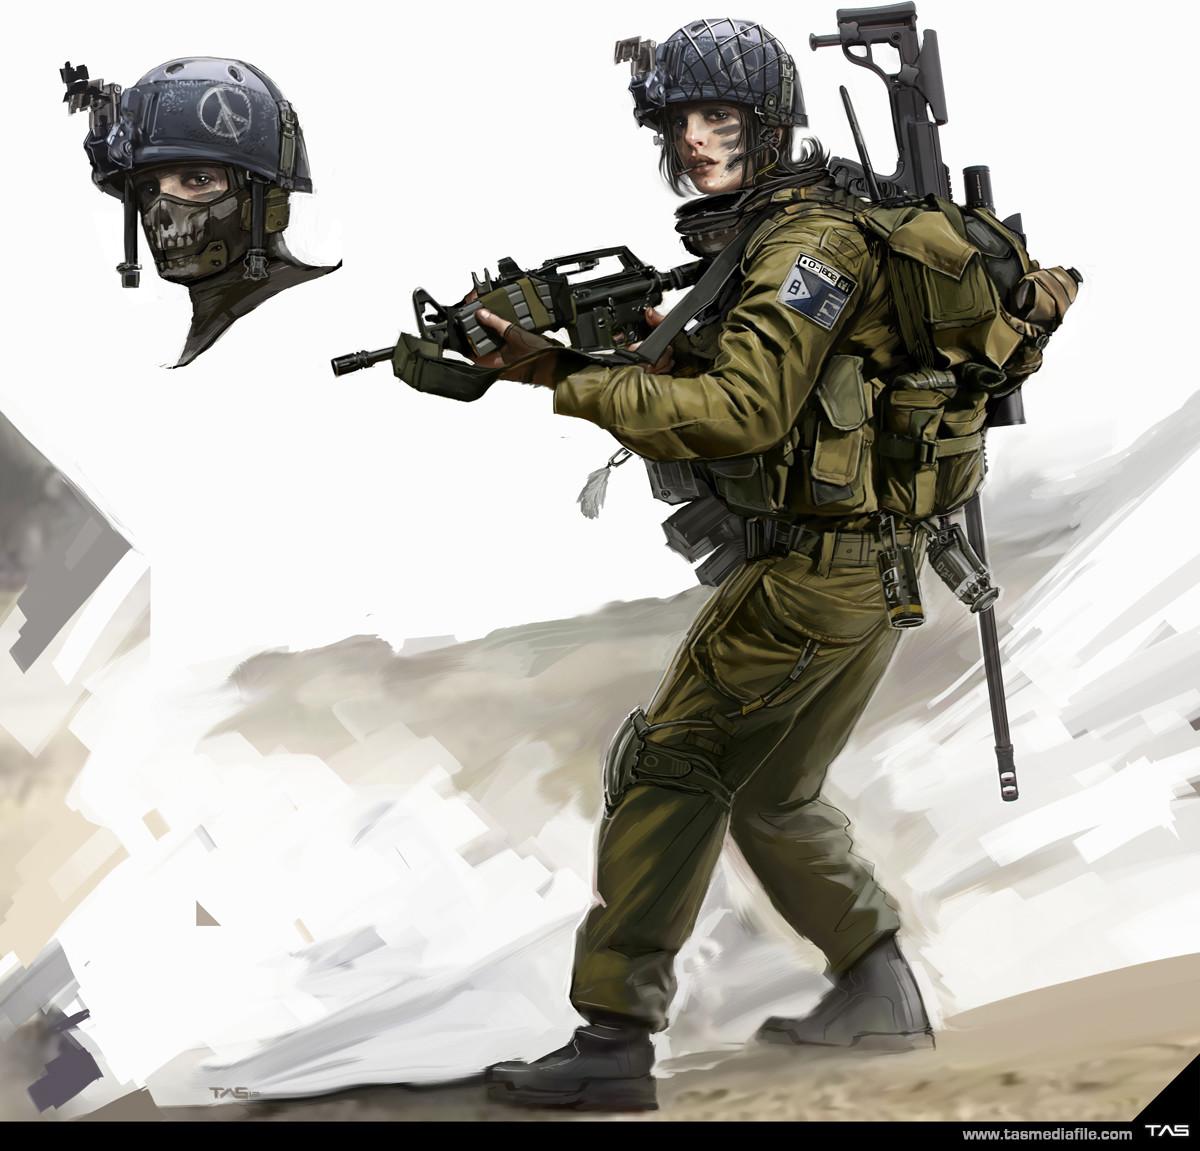 Apocalyptic Soldier Pics: Isreali Soldier, Thomas A. Szakolczay